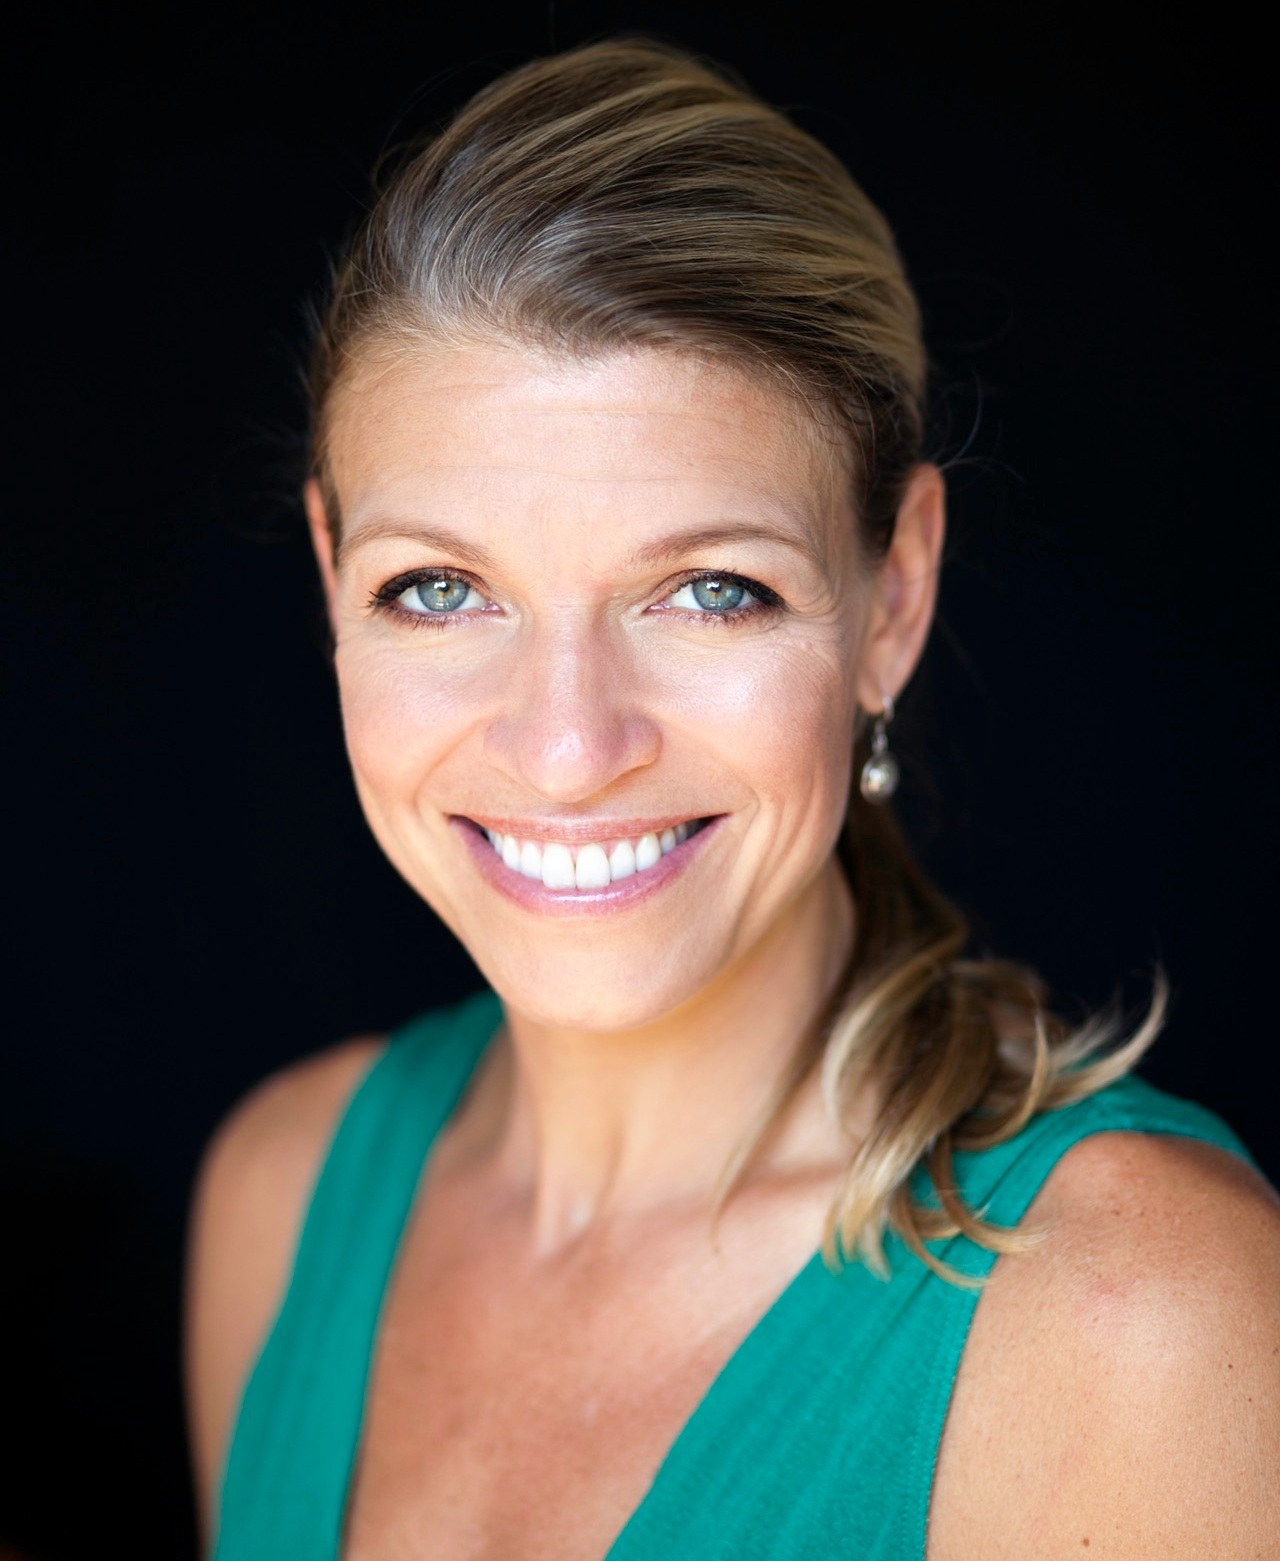 Jessica Rueger